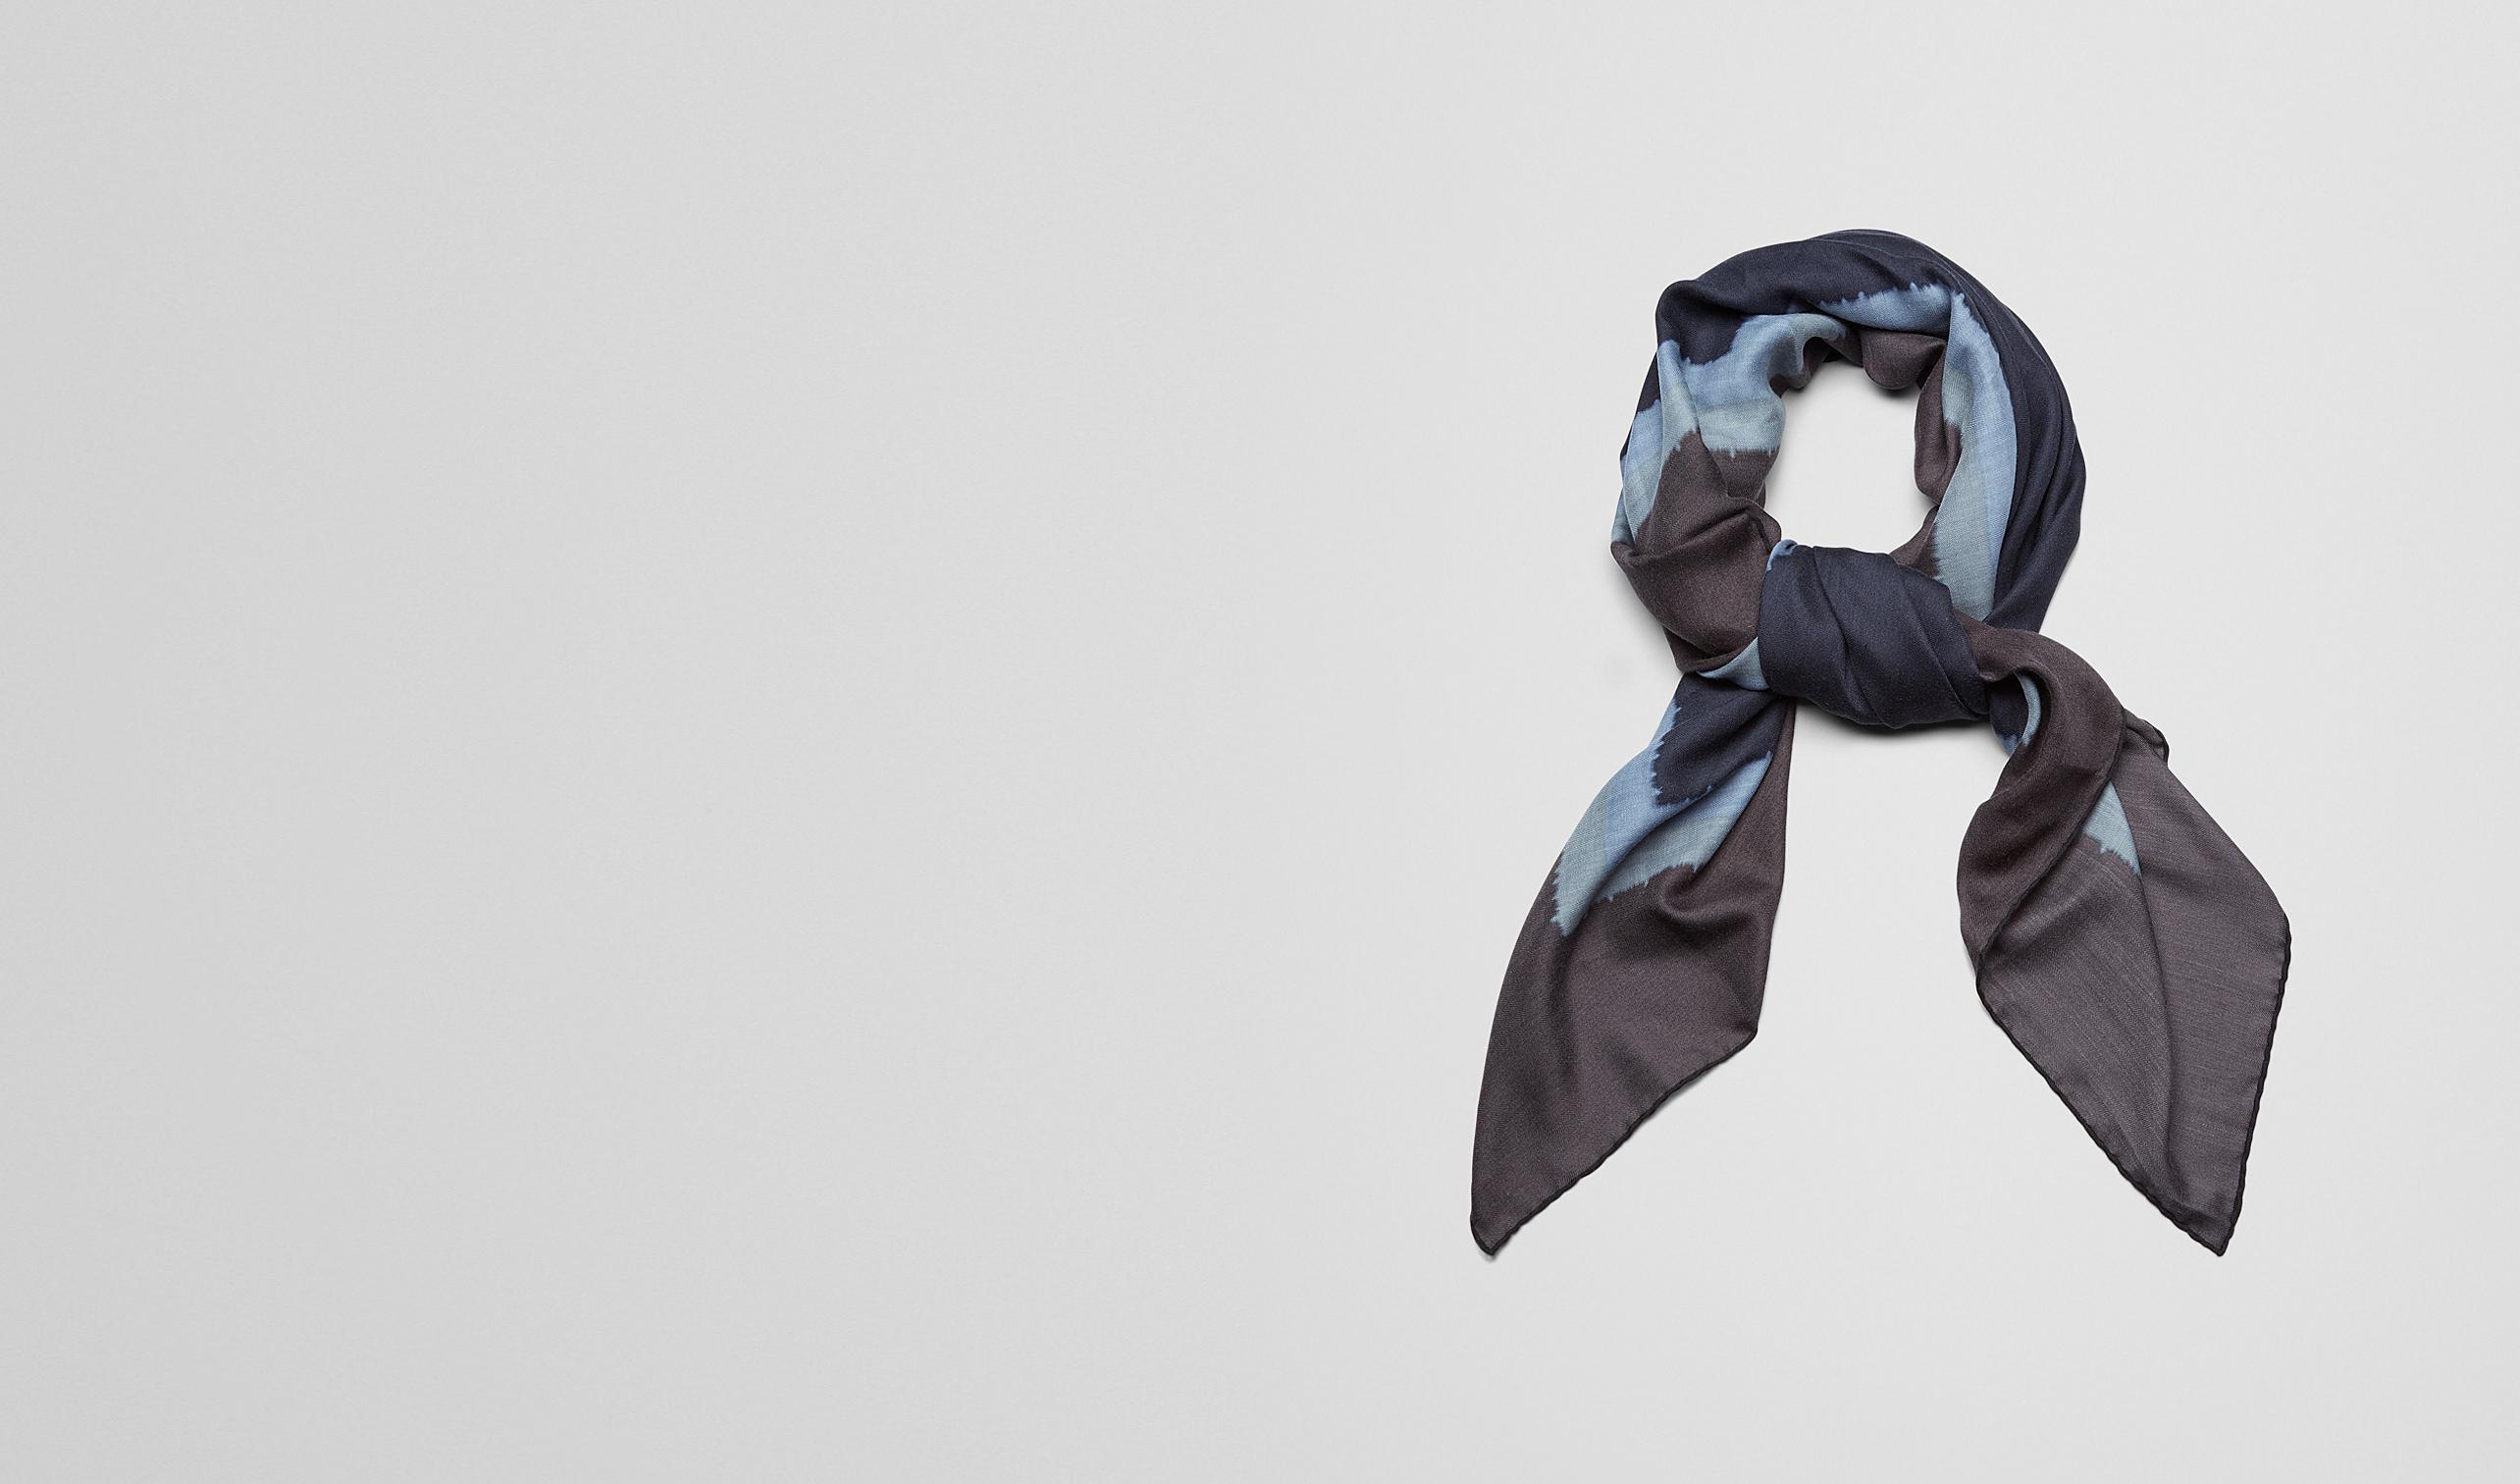 BOTTEGA VENETA écharpe ou gant ou chapeau U ÉCHARPE MIDNIGHT BLUE DARK GREY EN CACHEMIRE pl